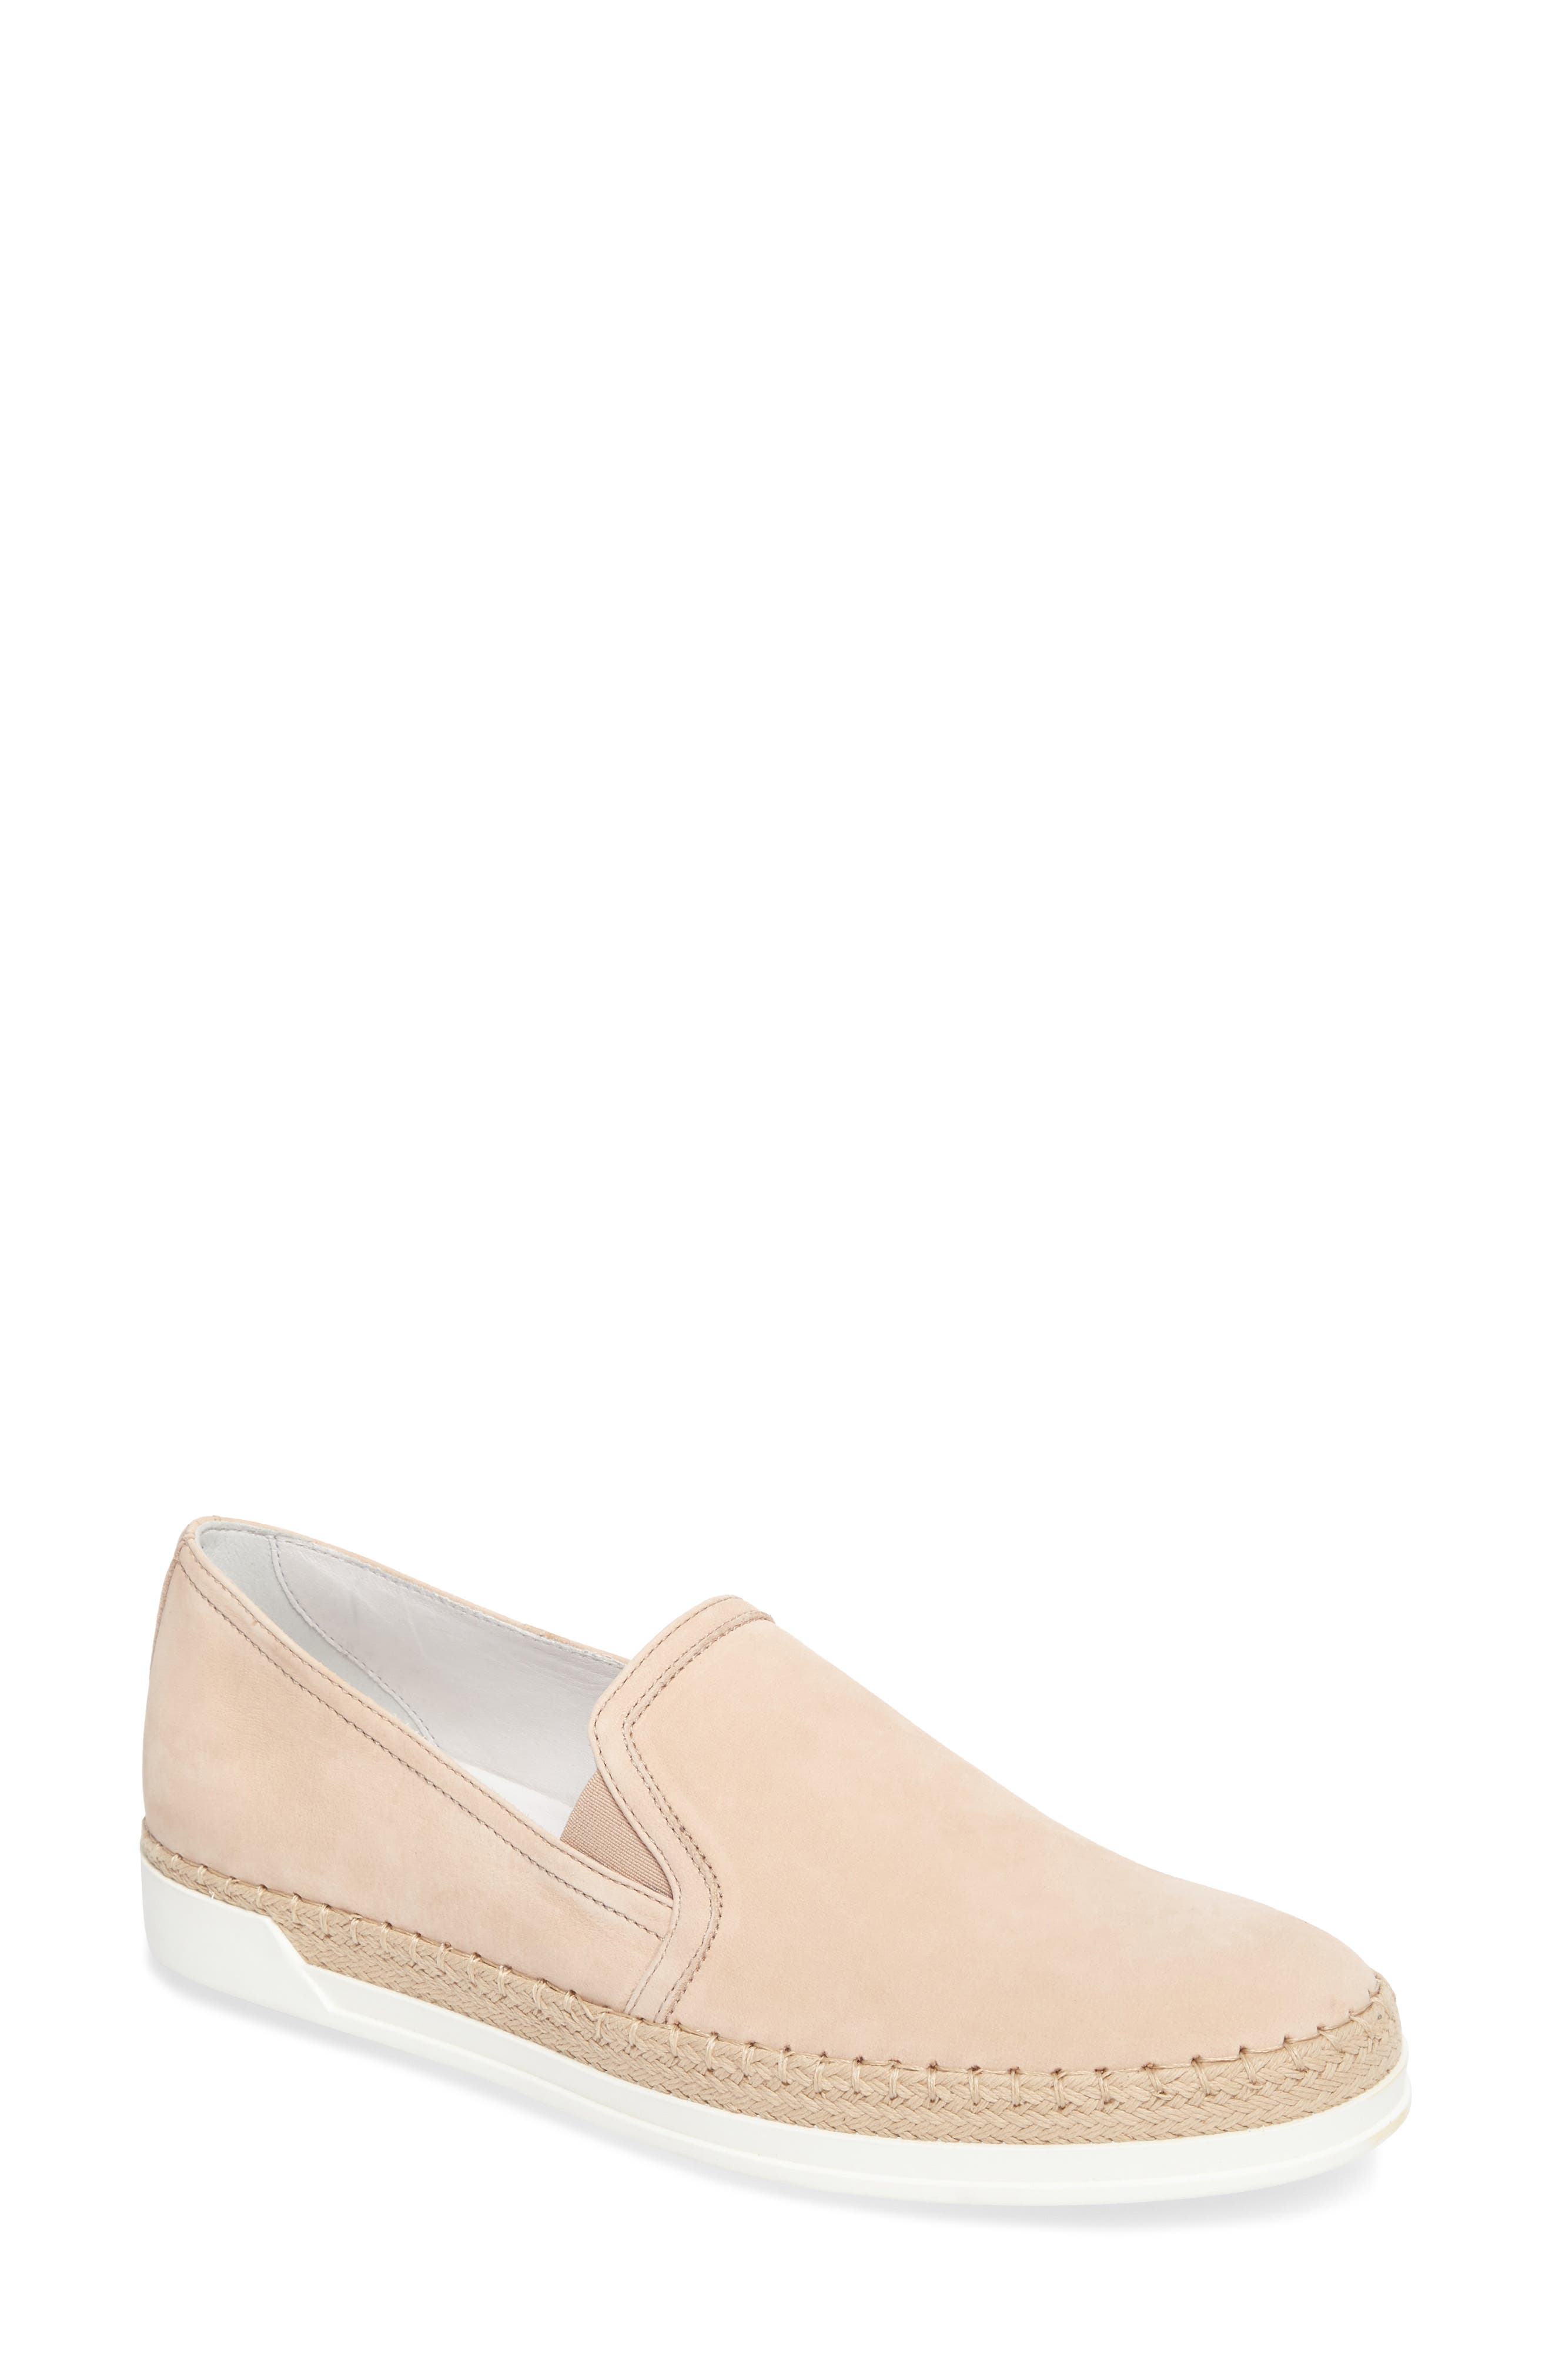 Espadrille Slip-On Sneaker,                         Main,                         color, 664